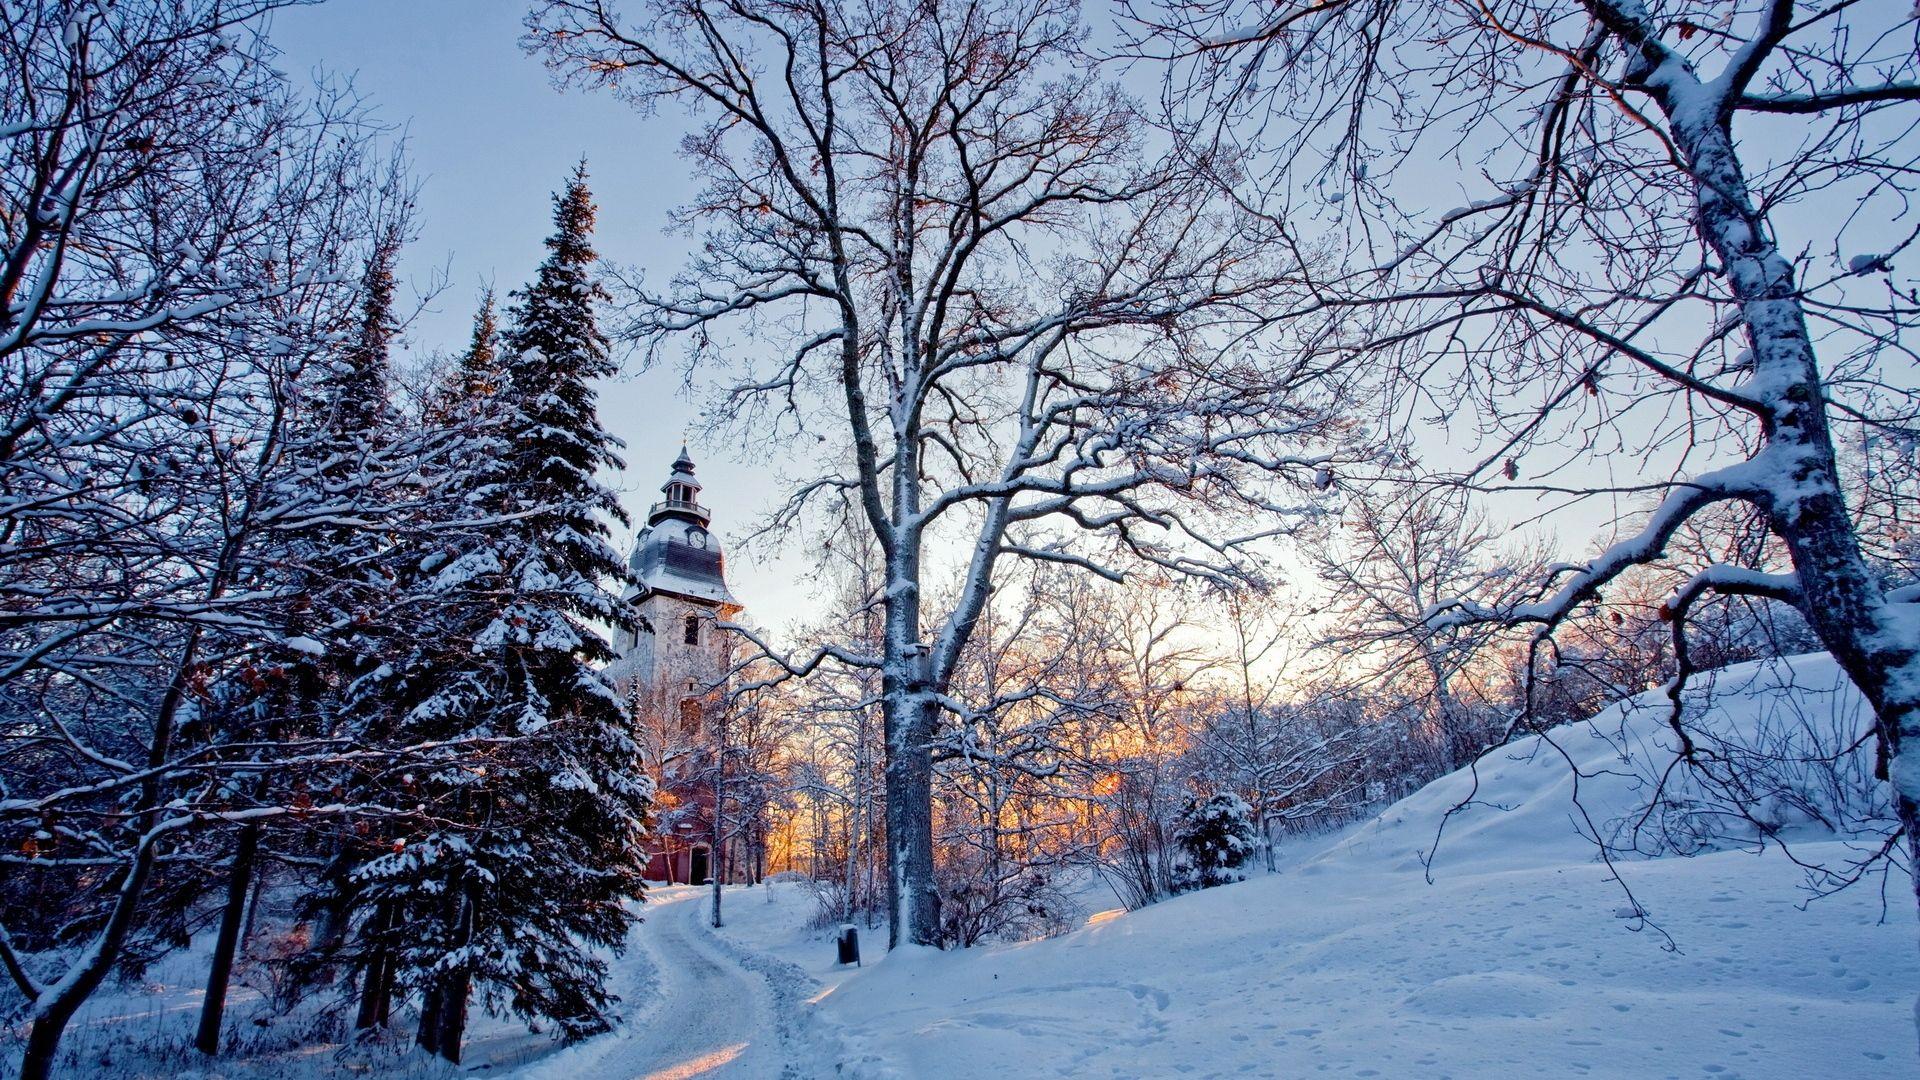 Free Winter background image